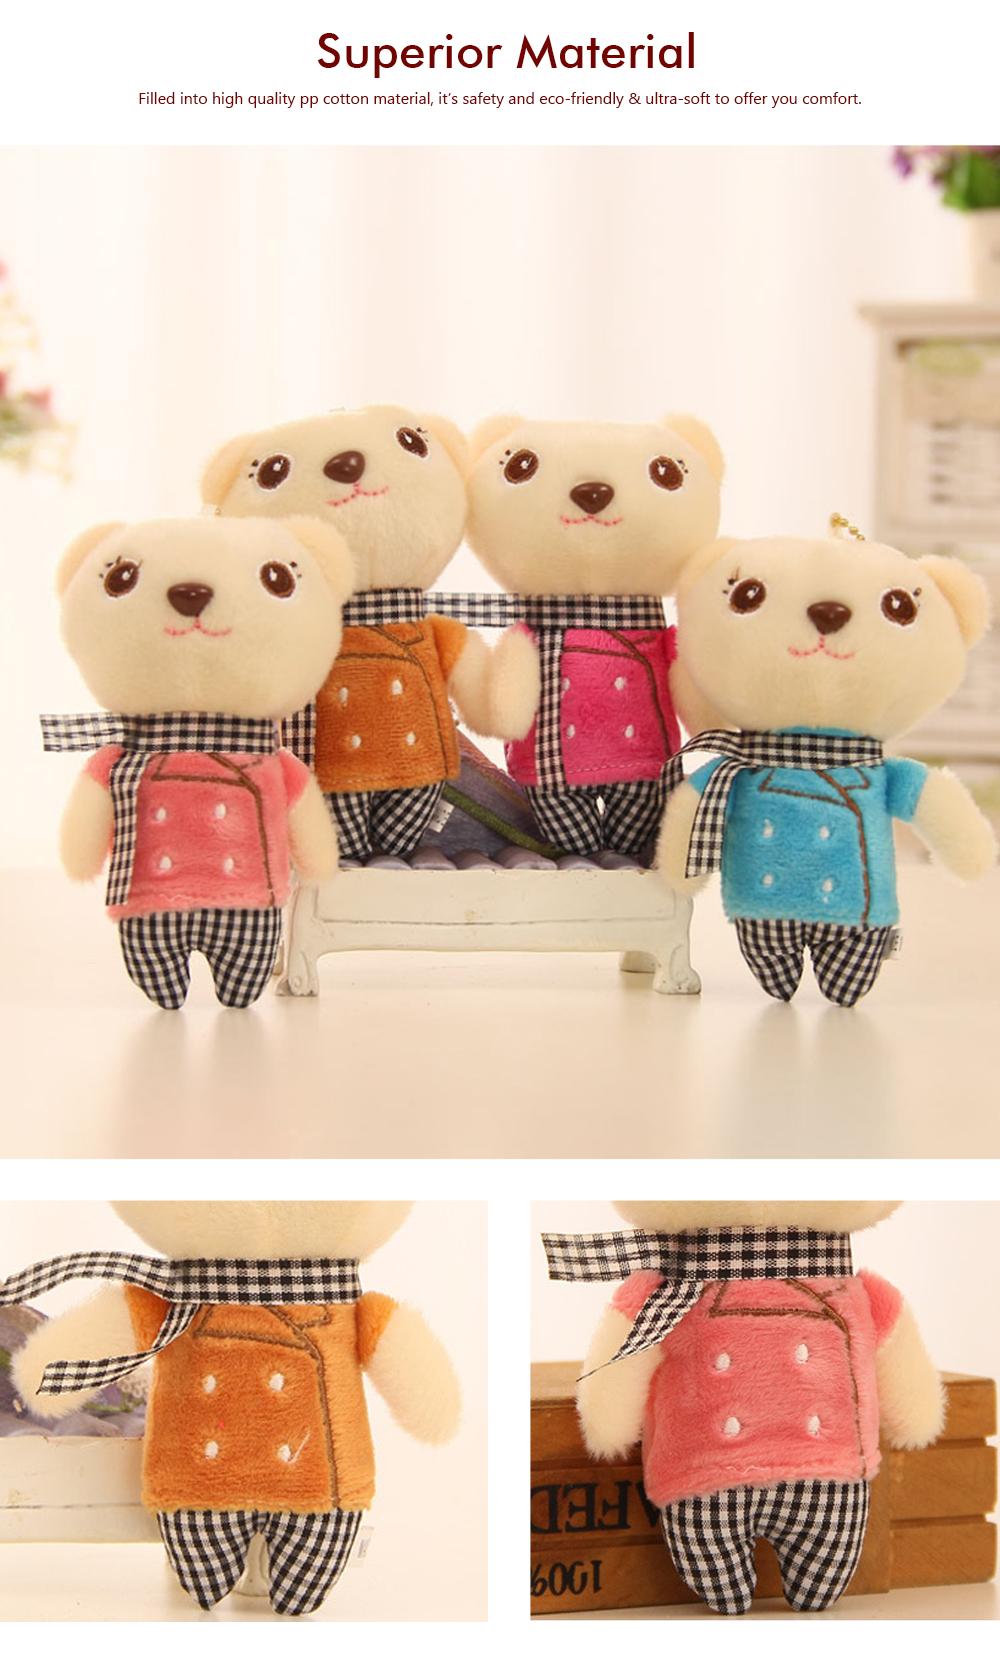 Windbreaker Rabbit Plush Toy, Bunny Bear Doll Small Pendant For Children And Shopping Mall Furnishings 1